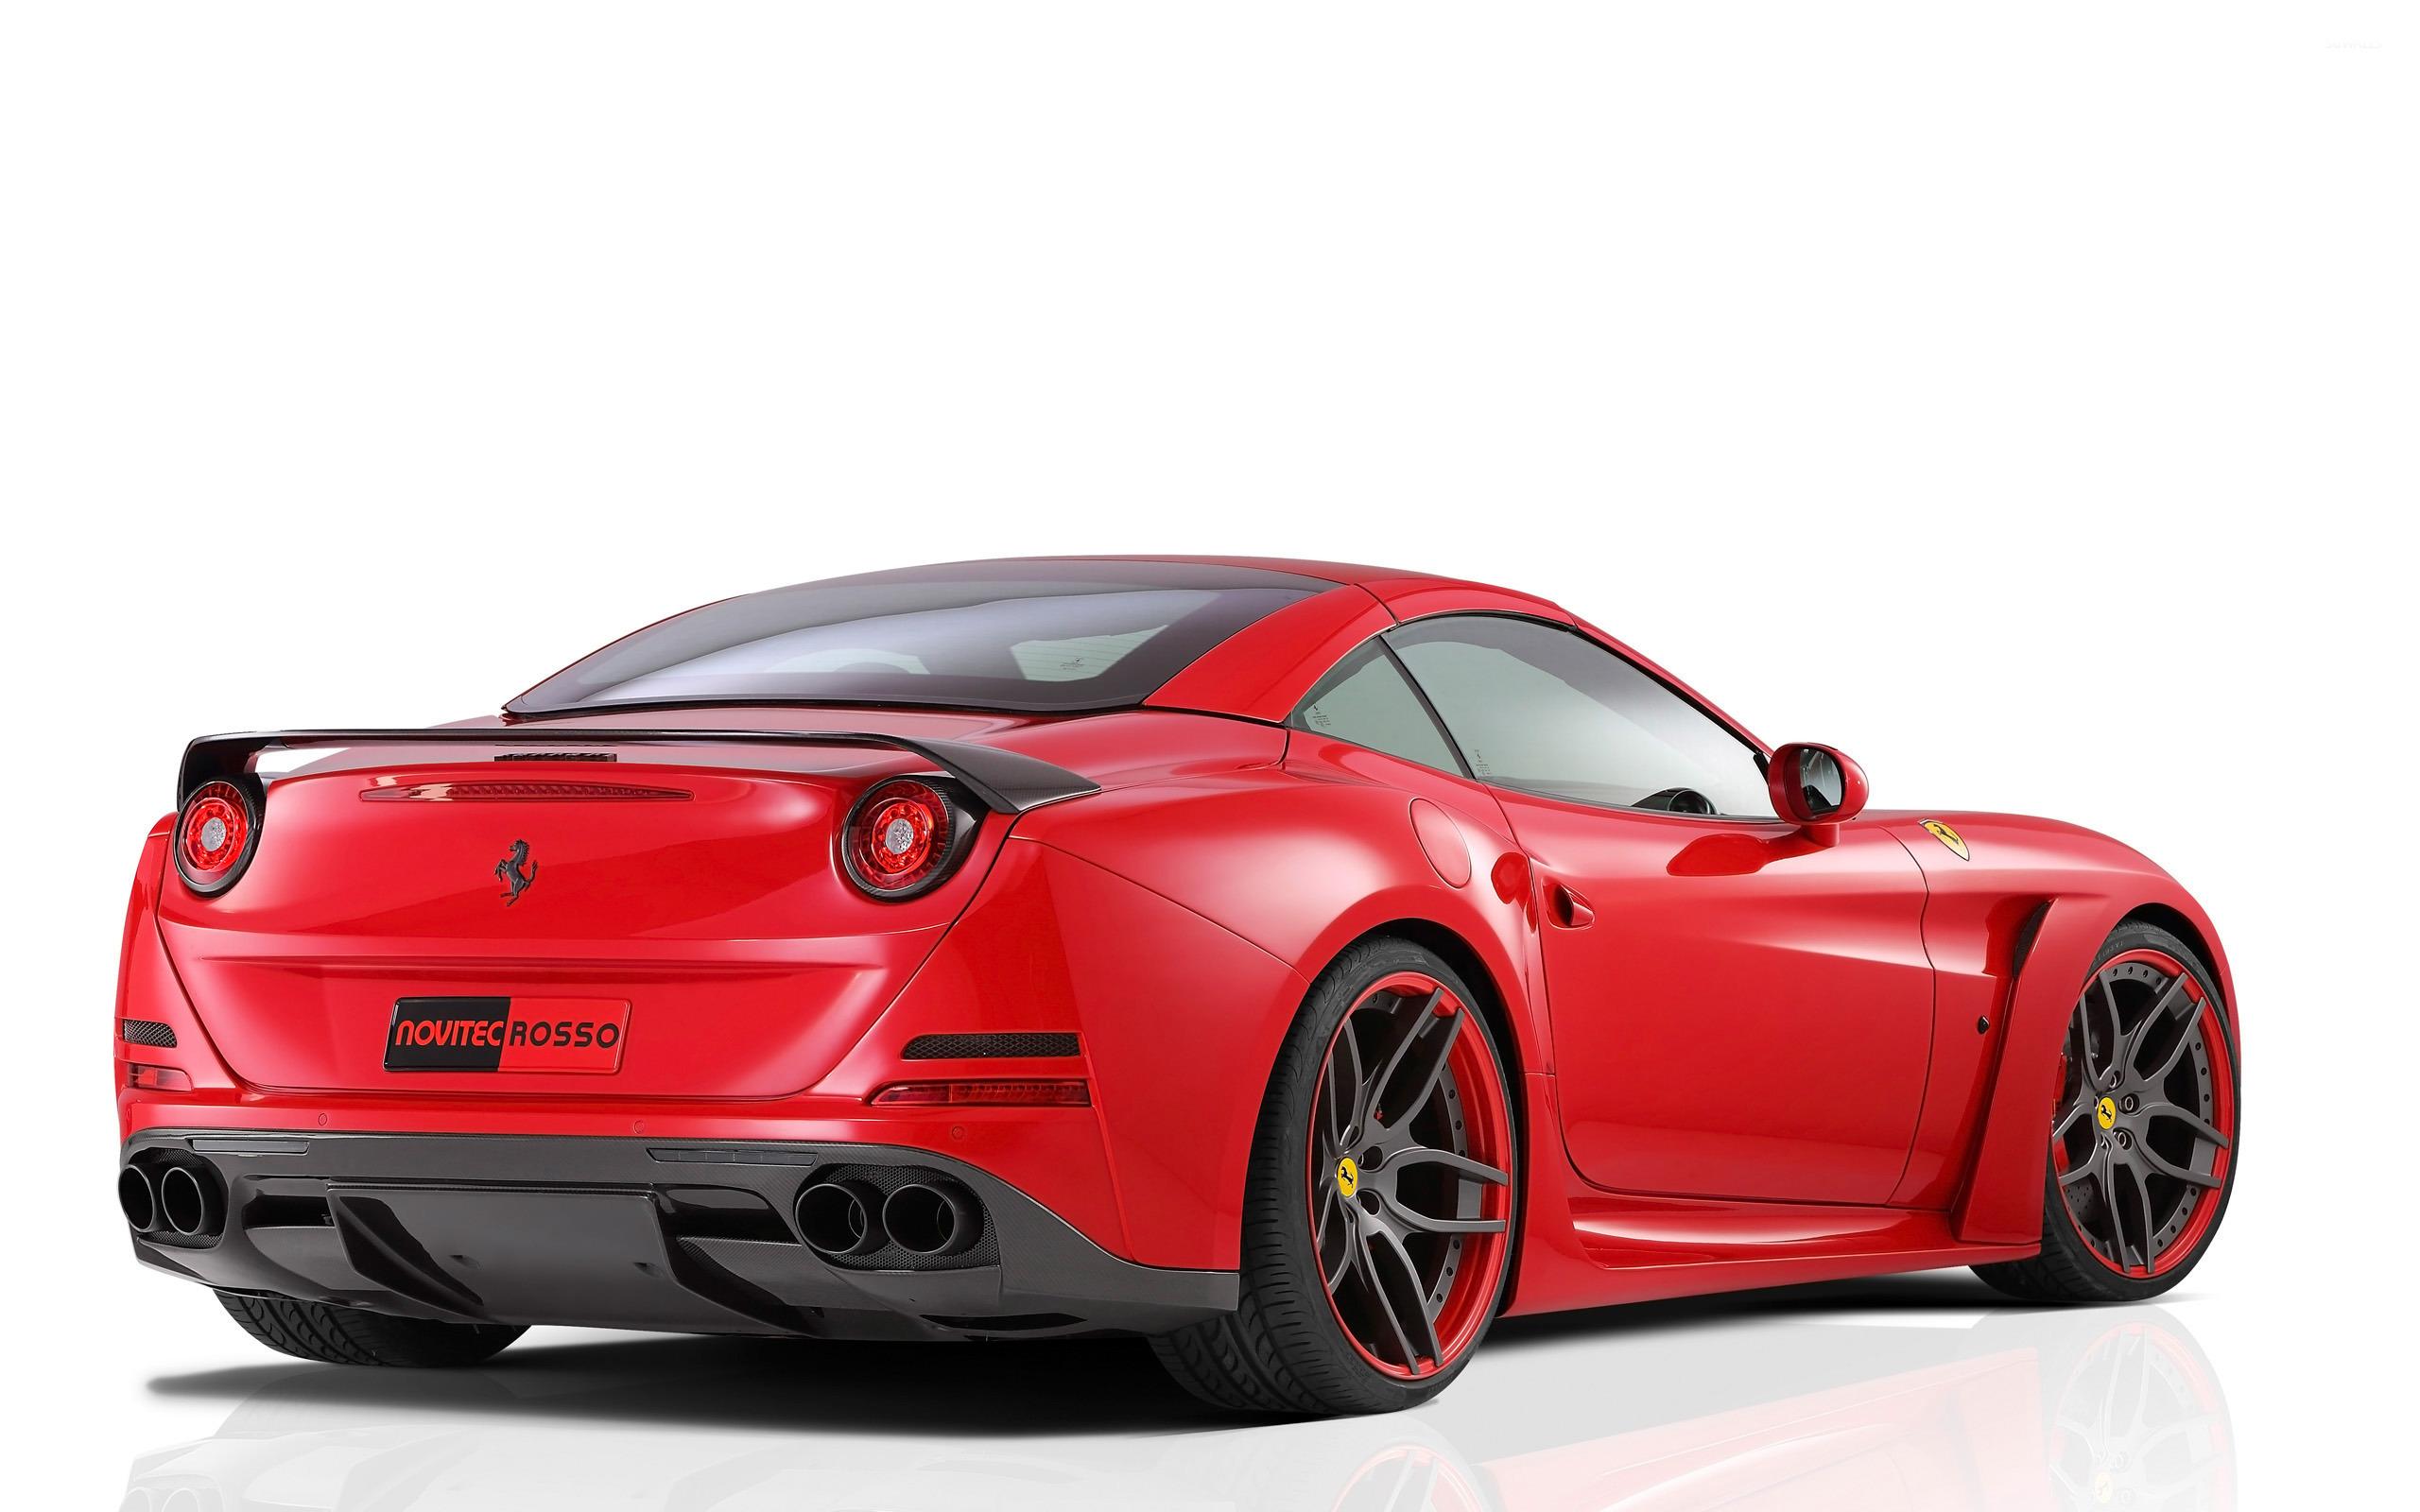 2015 Novitec Rosso Ferrari California Back View Wallpaper Car